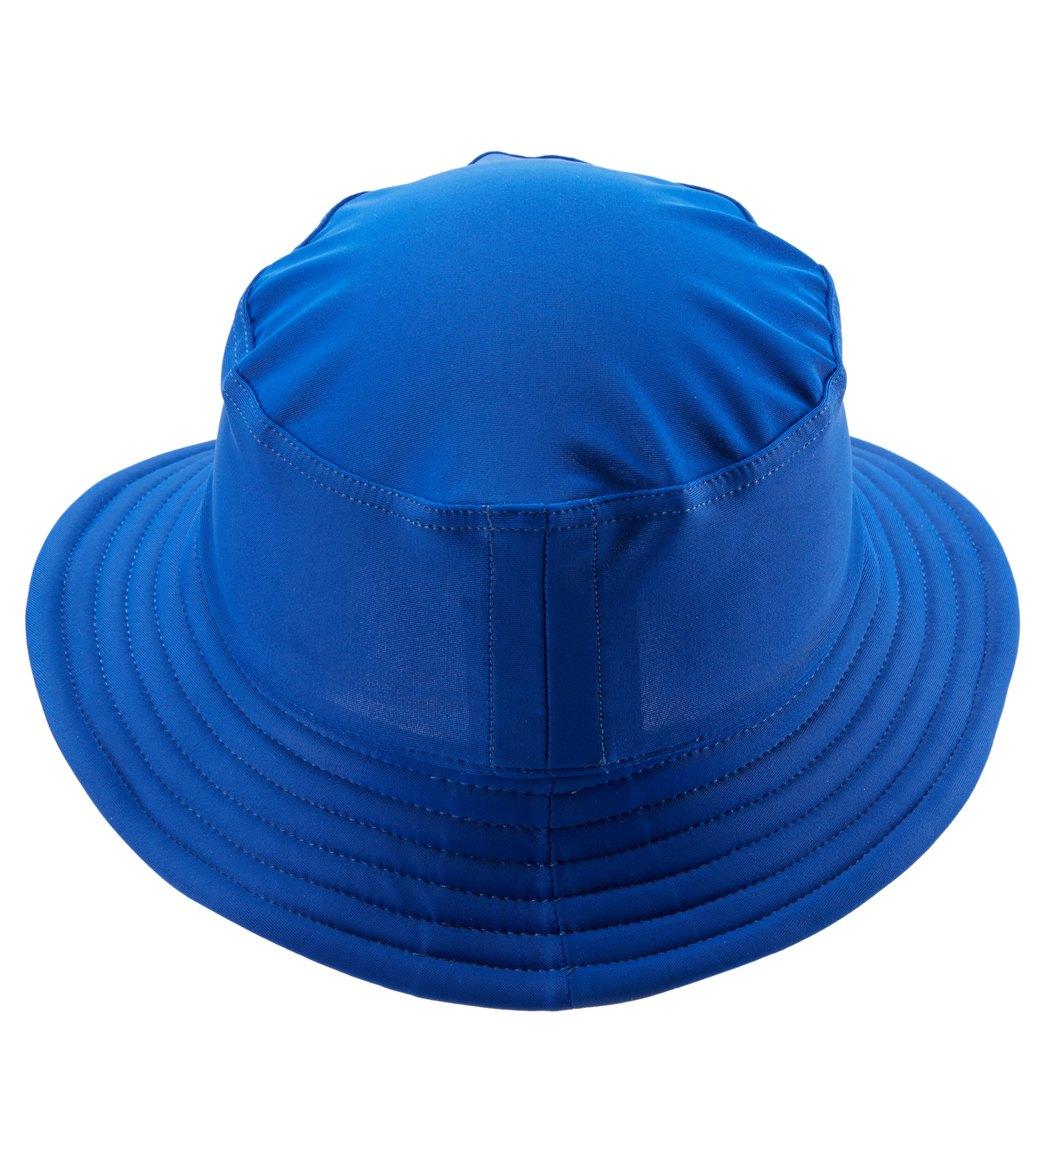 651aed78073 Platypus Australia Boys  Bucket Hat at SwimOutlet.com